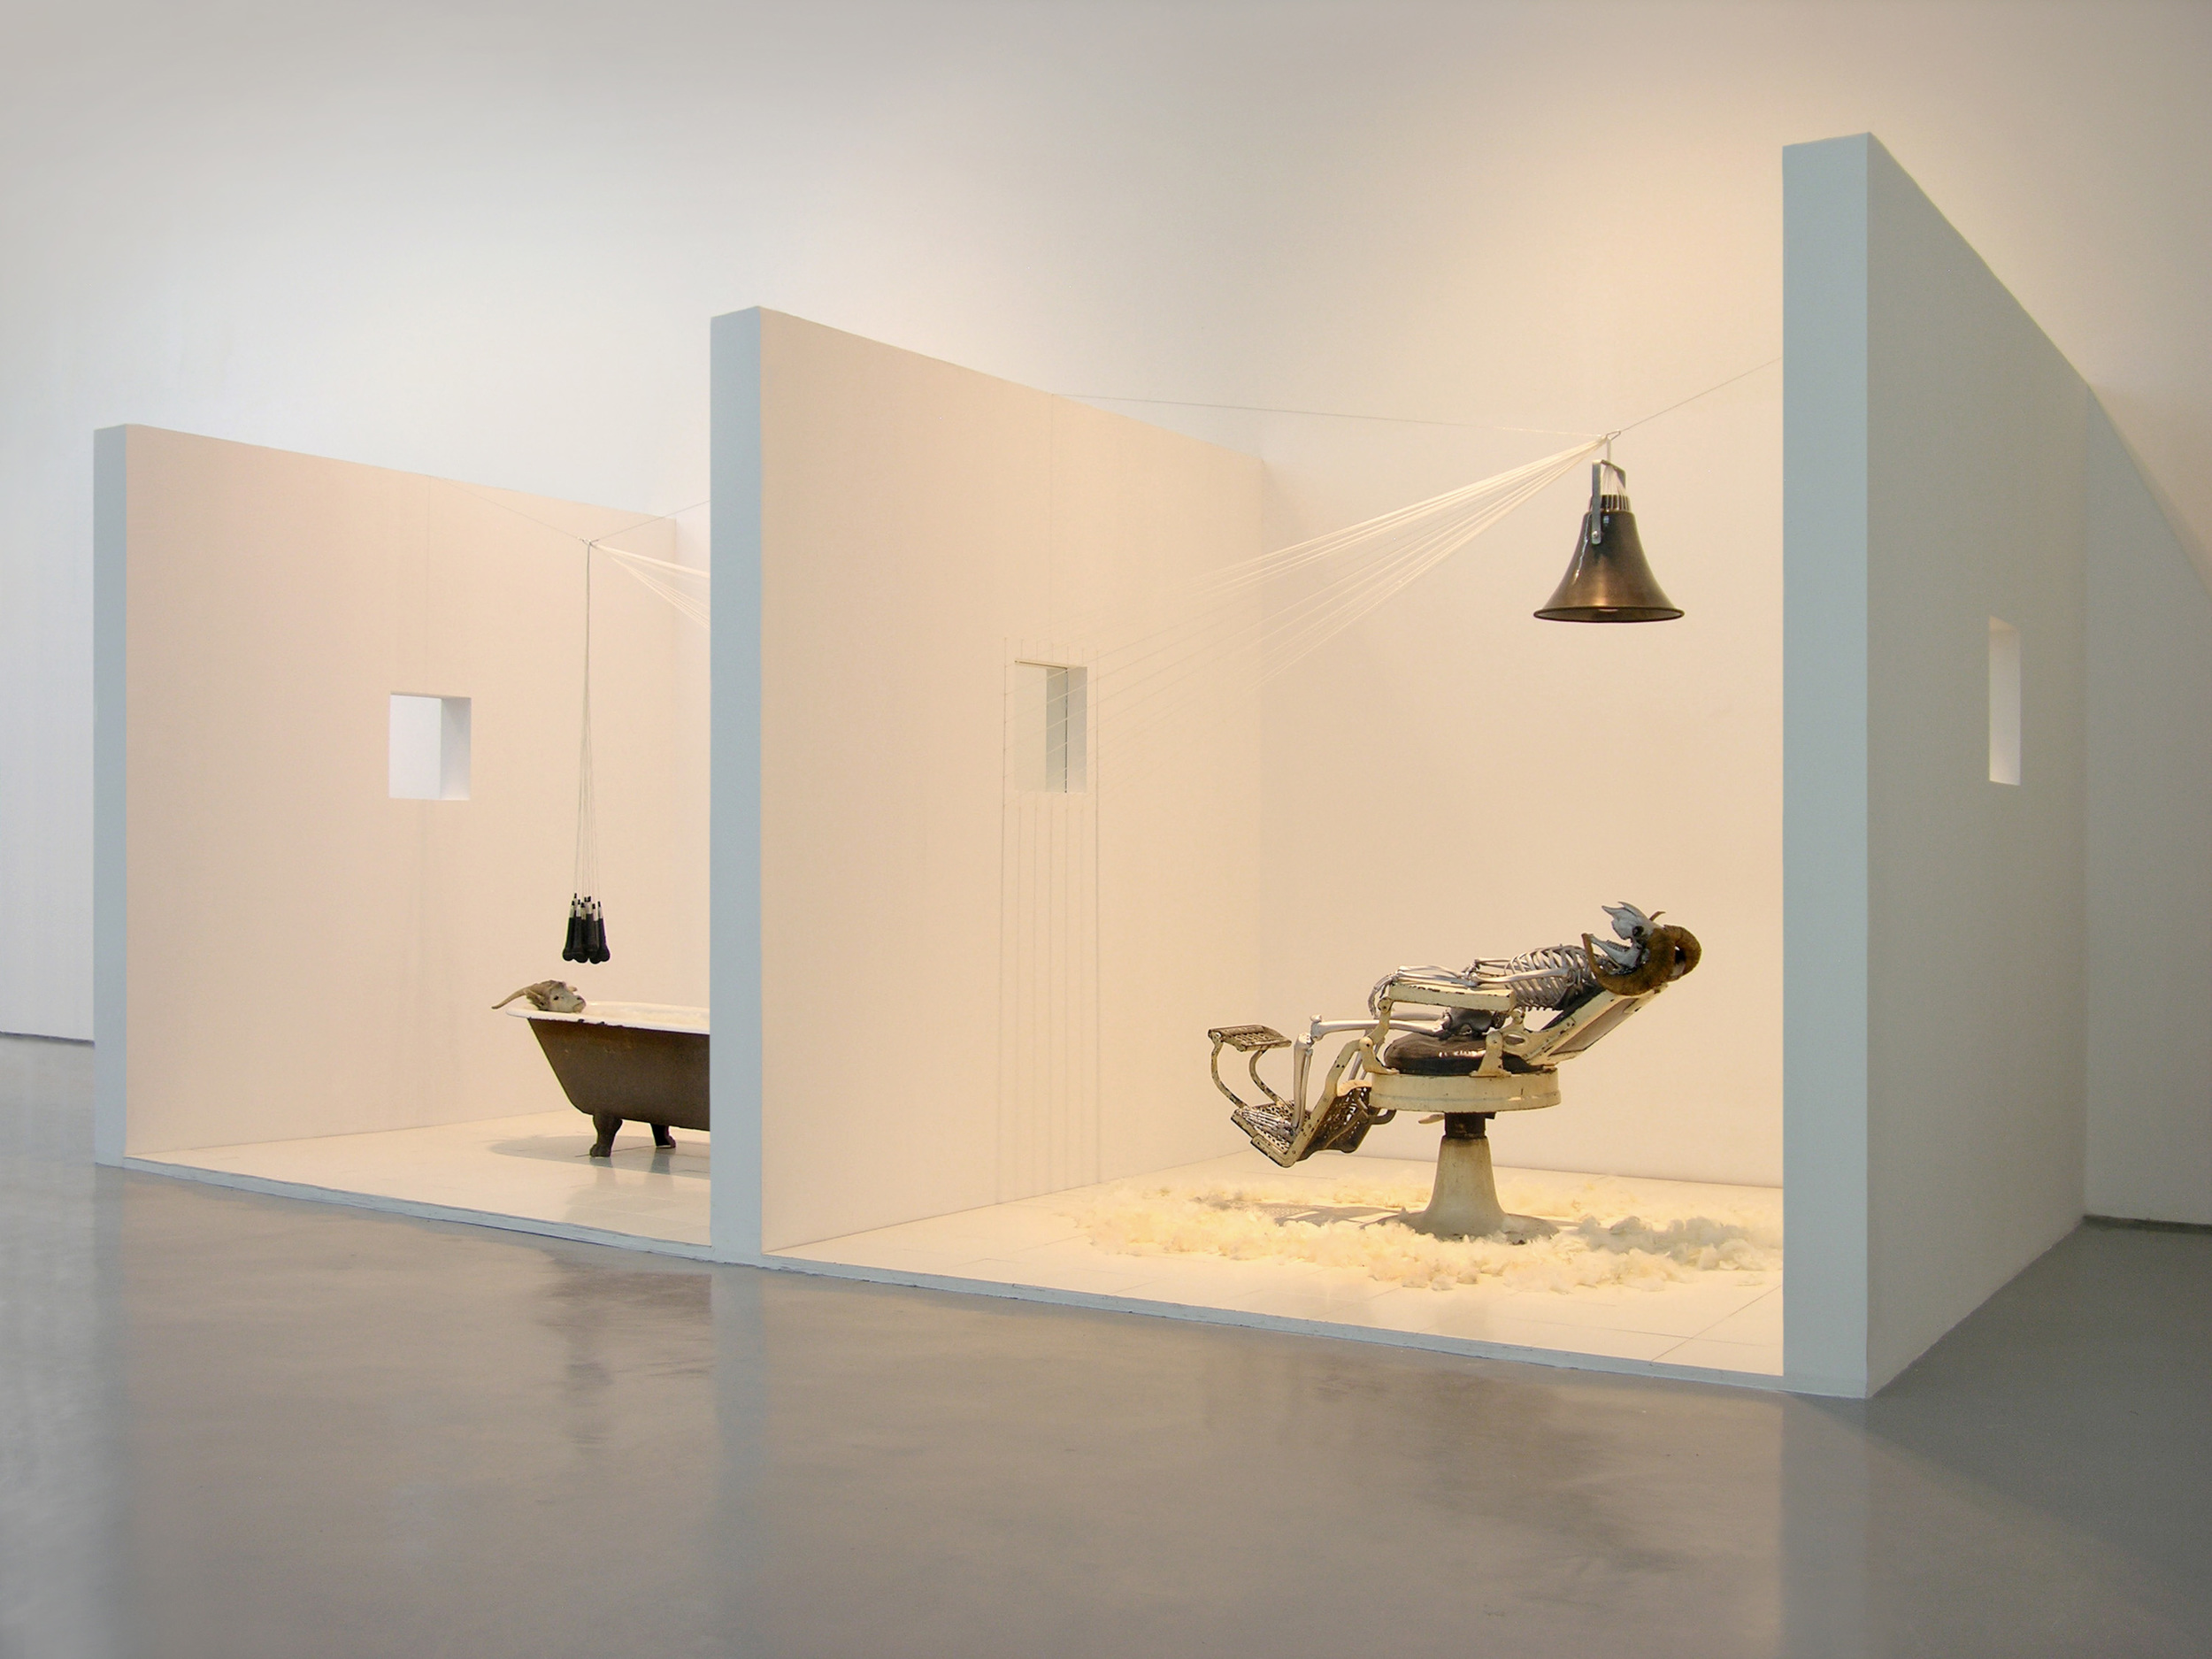 Gao Lei 高磊, NS24, Mixed media installation 综合材料装置, 2011, 660 x 300 x 2800 cm